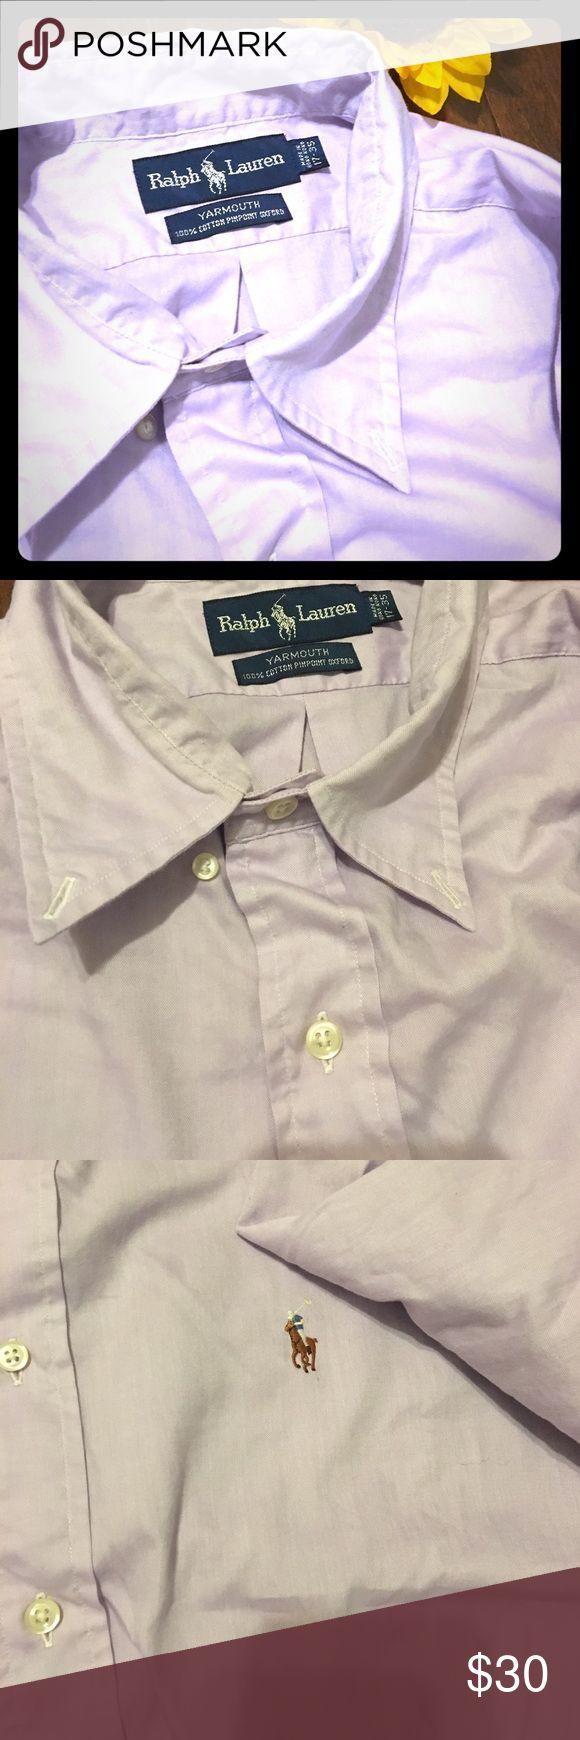 Light purple dress shirt Light purple genuine Ralph Lauren dress shirt ⭐️Great condition! Pet and smoke free home.🌻 Price is always negotiable 😊 Polo by Ralph Lauren Shirts Dress Shirts